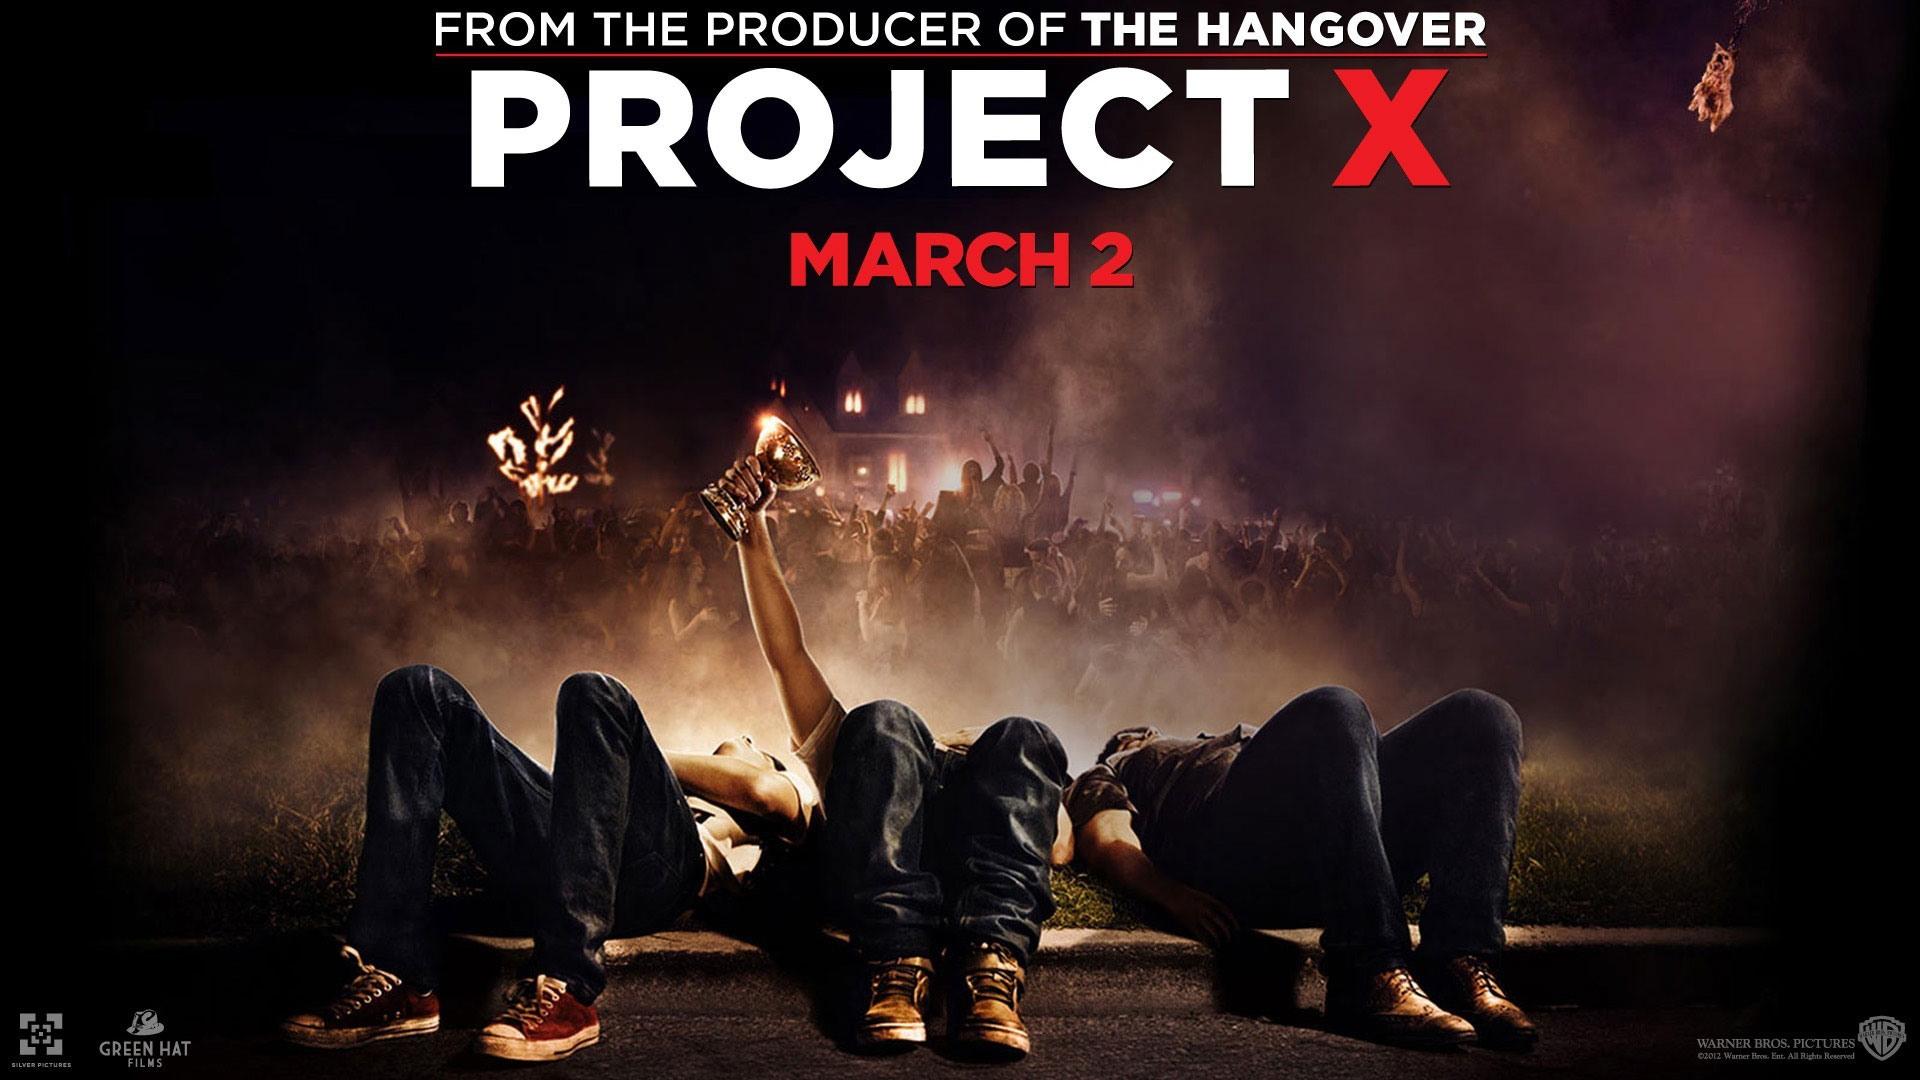 Project X Movie wallpaper - 854349